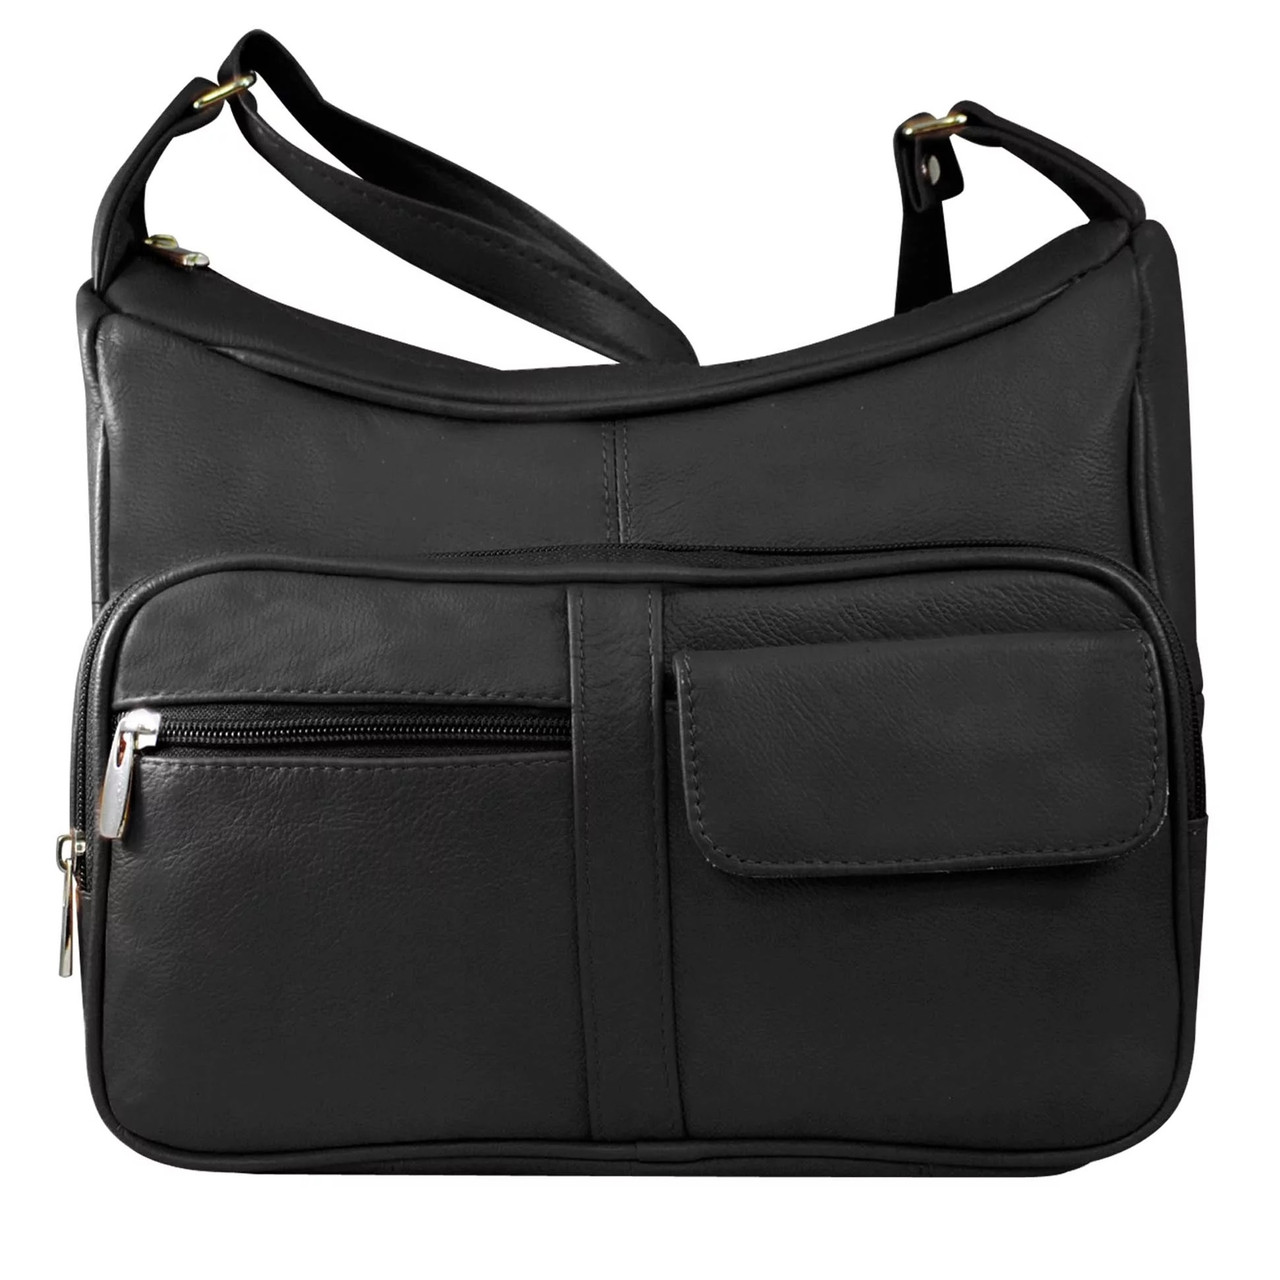 Women Multipockets Slim Small Shoulder Purse Bag Crossbody Side Clutch Handbag